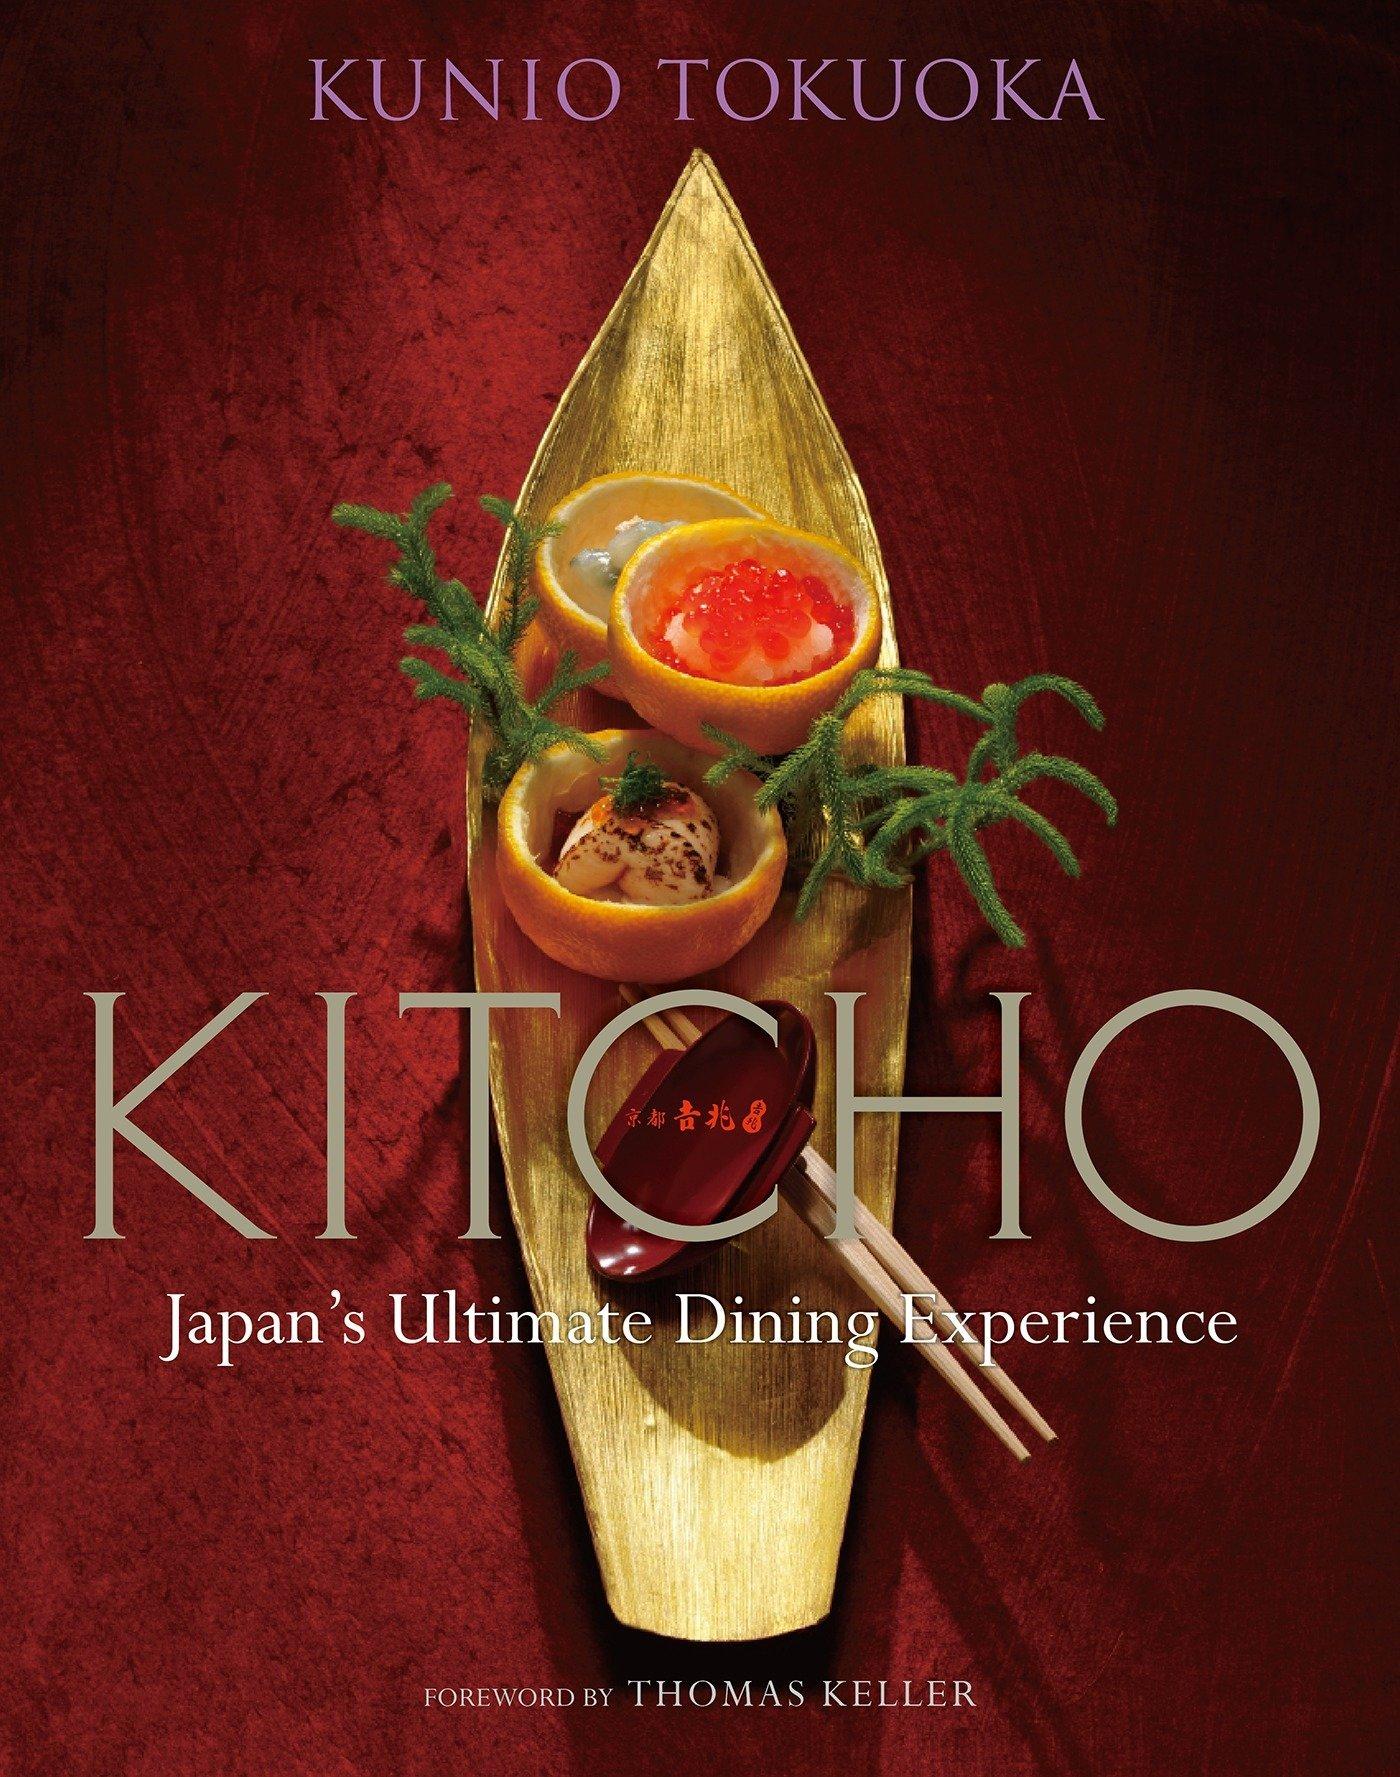 Kitcho: Japan's Ultimate Dining Experience by Brand: Kodansha USA